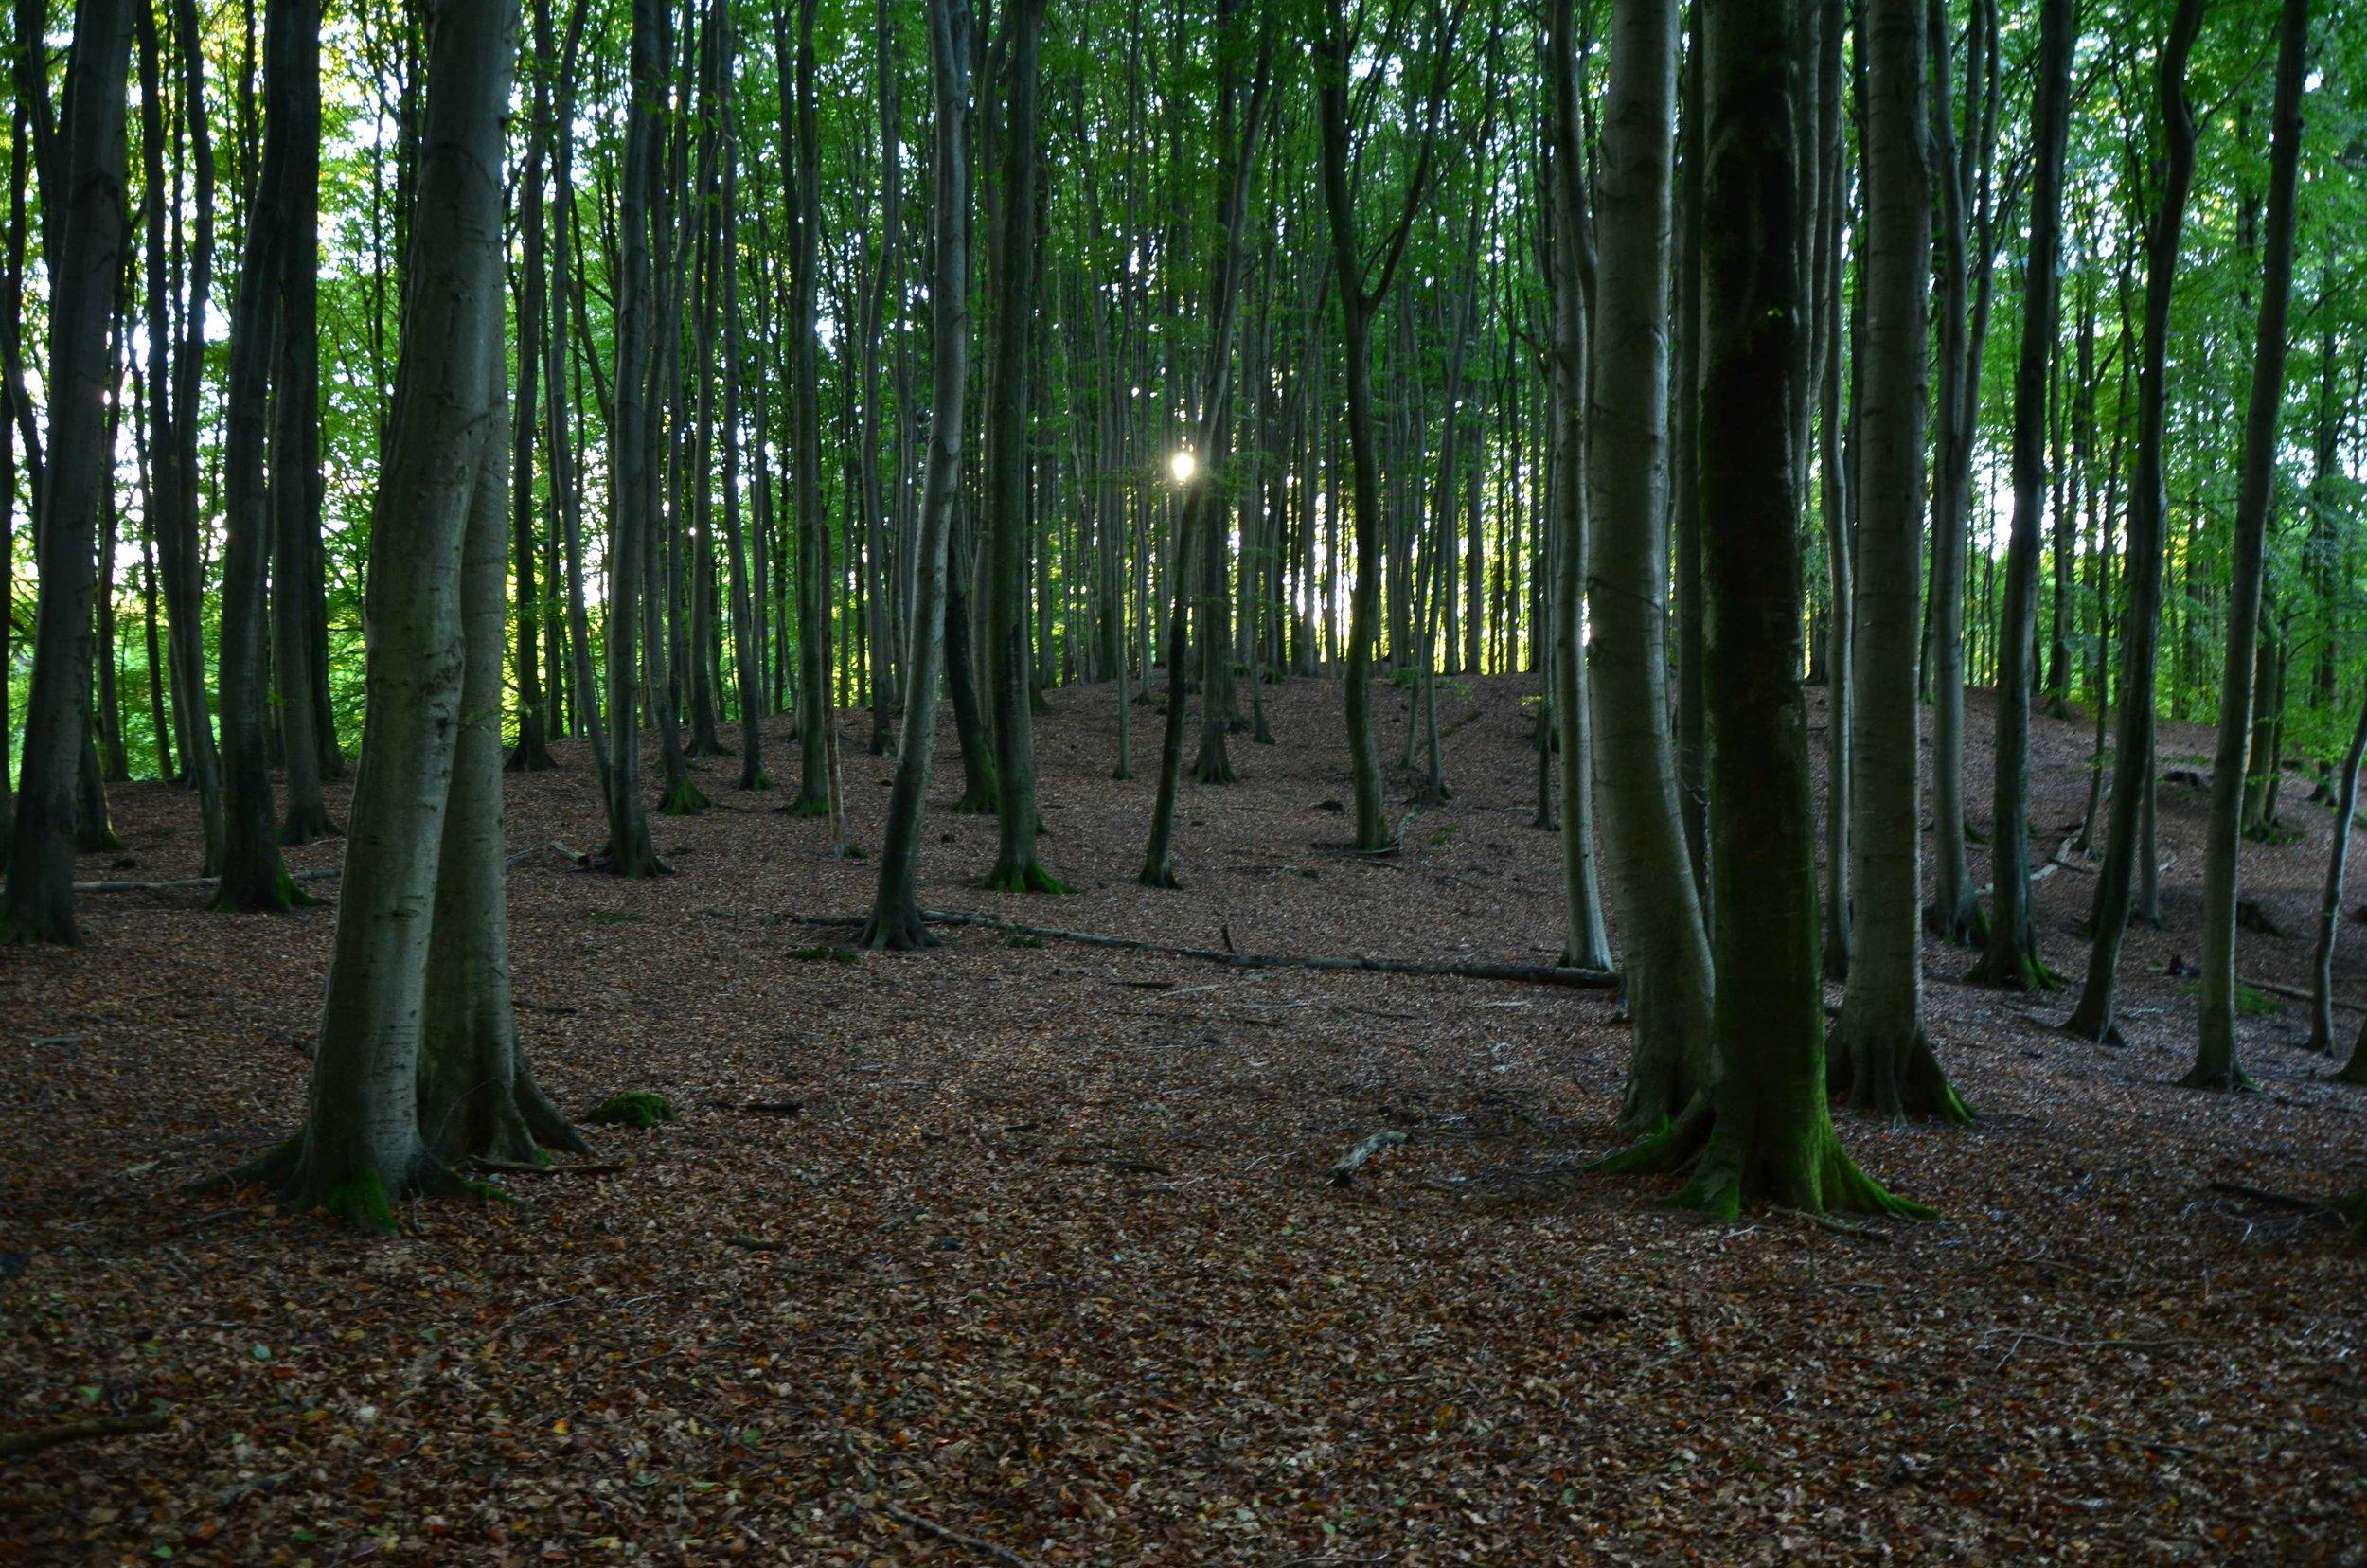 Bergwaldprojekt_Sassnitz_Ruegen_Moor_150dpi_20171014_Credits_CC-BY-SA_Jenni_Ottilie_Keppler-68.jpg